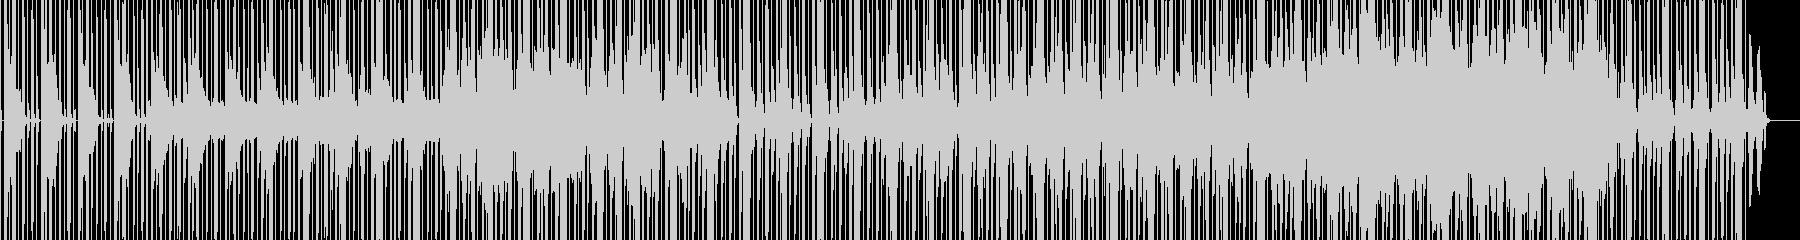 jazz/lo-fi/chillhopの未再生の波形